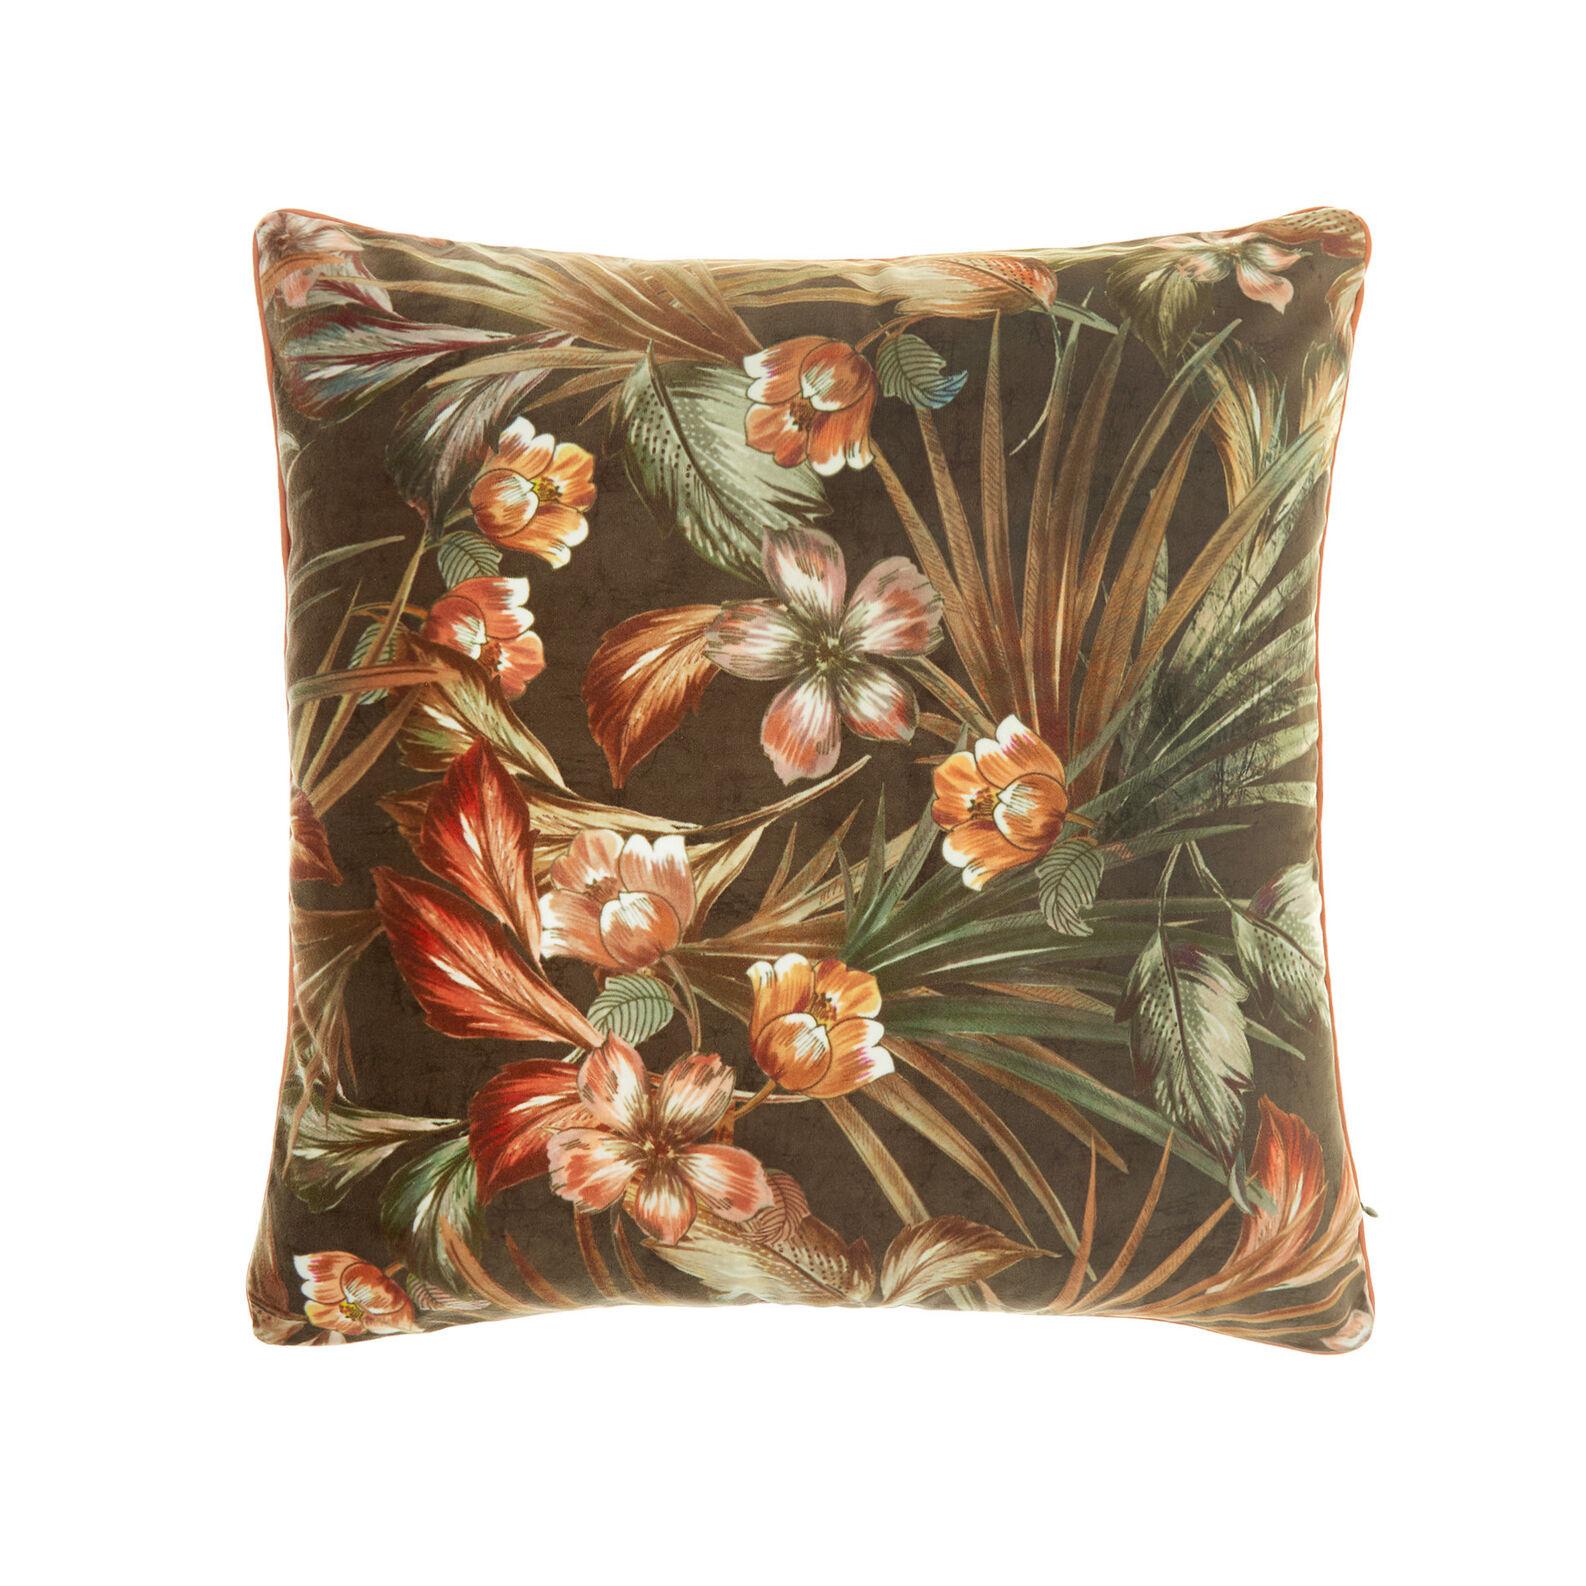 Velvet cushion with floral print (45x45cm)